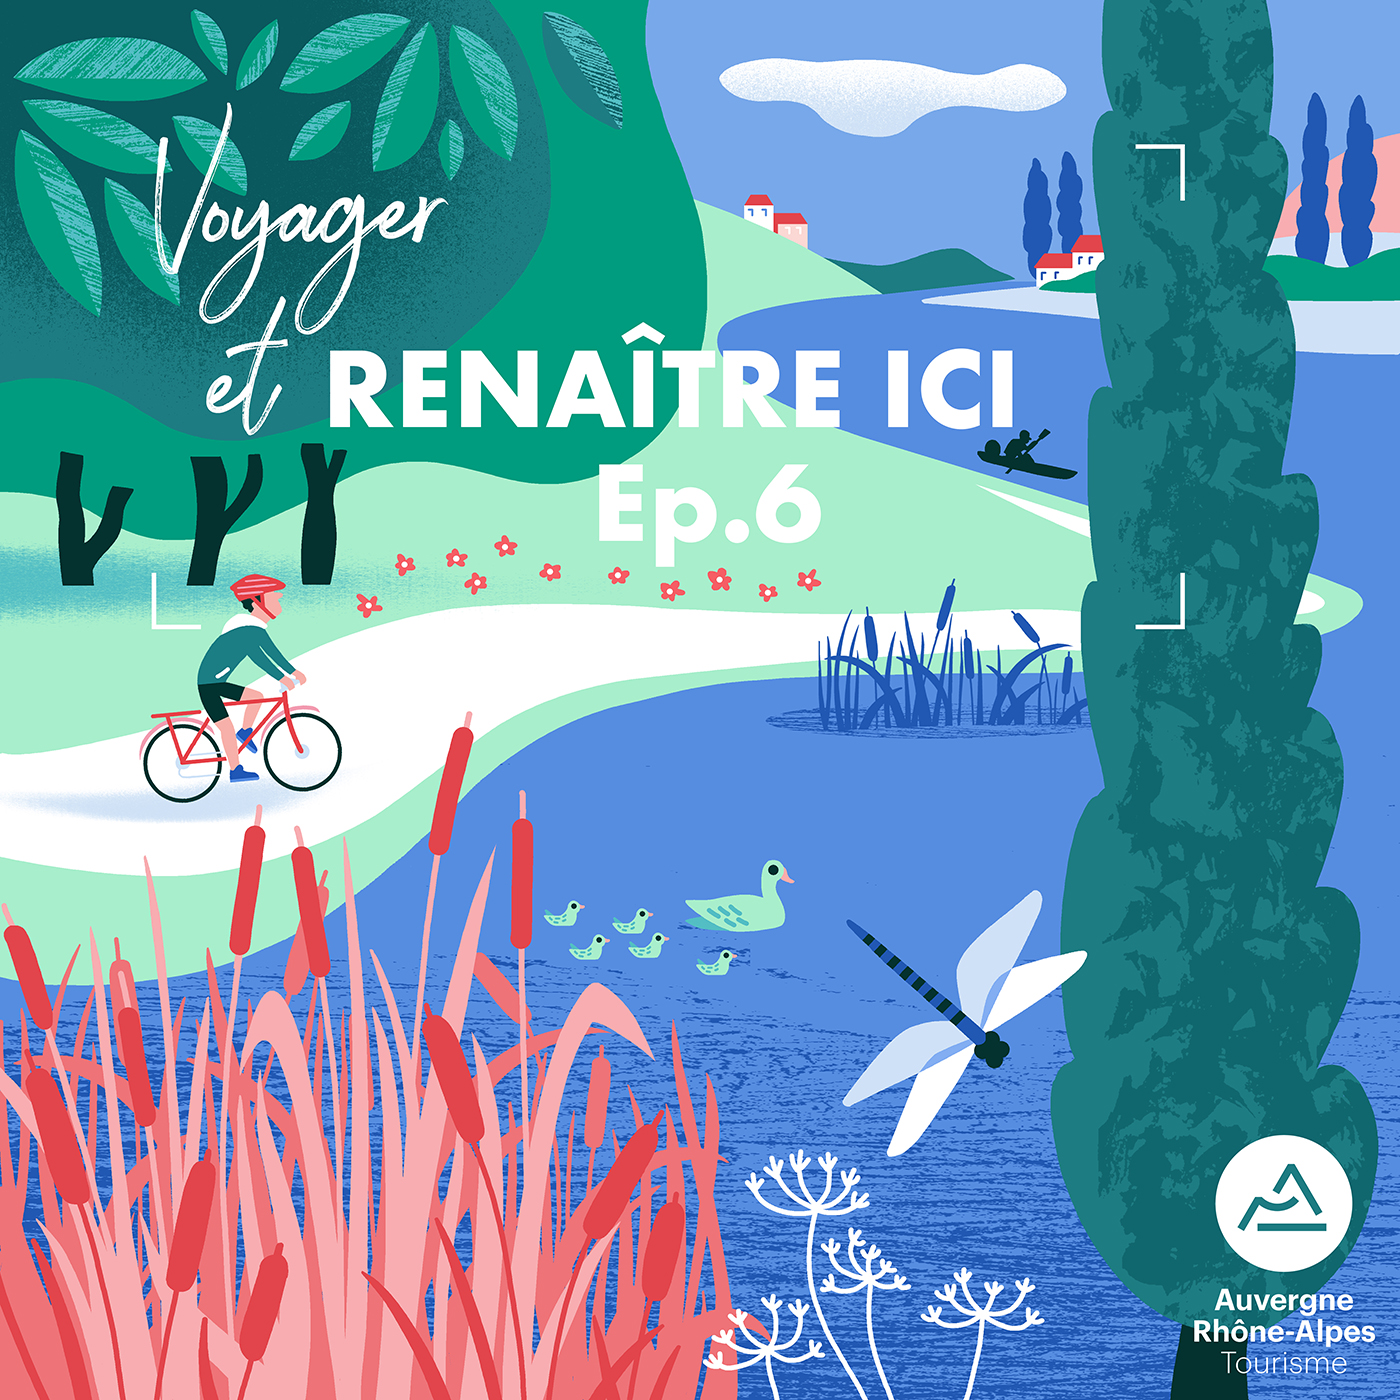 Clod-illustration-Podcast-Auvergne-Rhône-Alpes